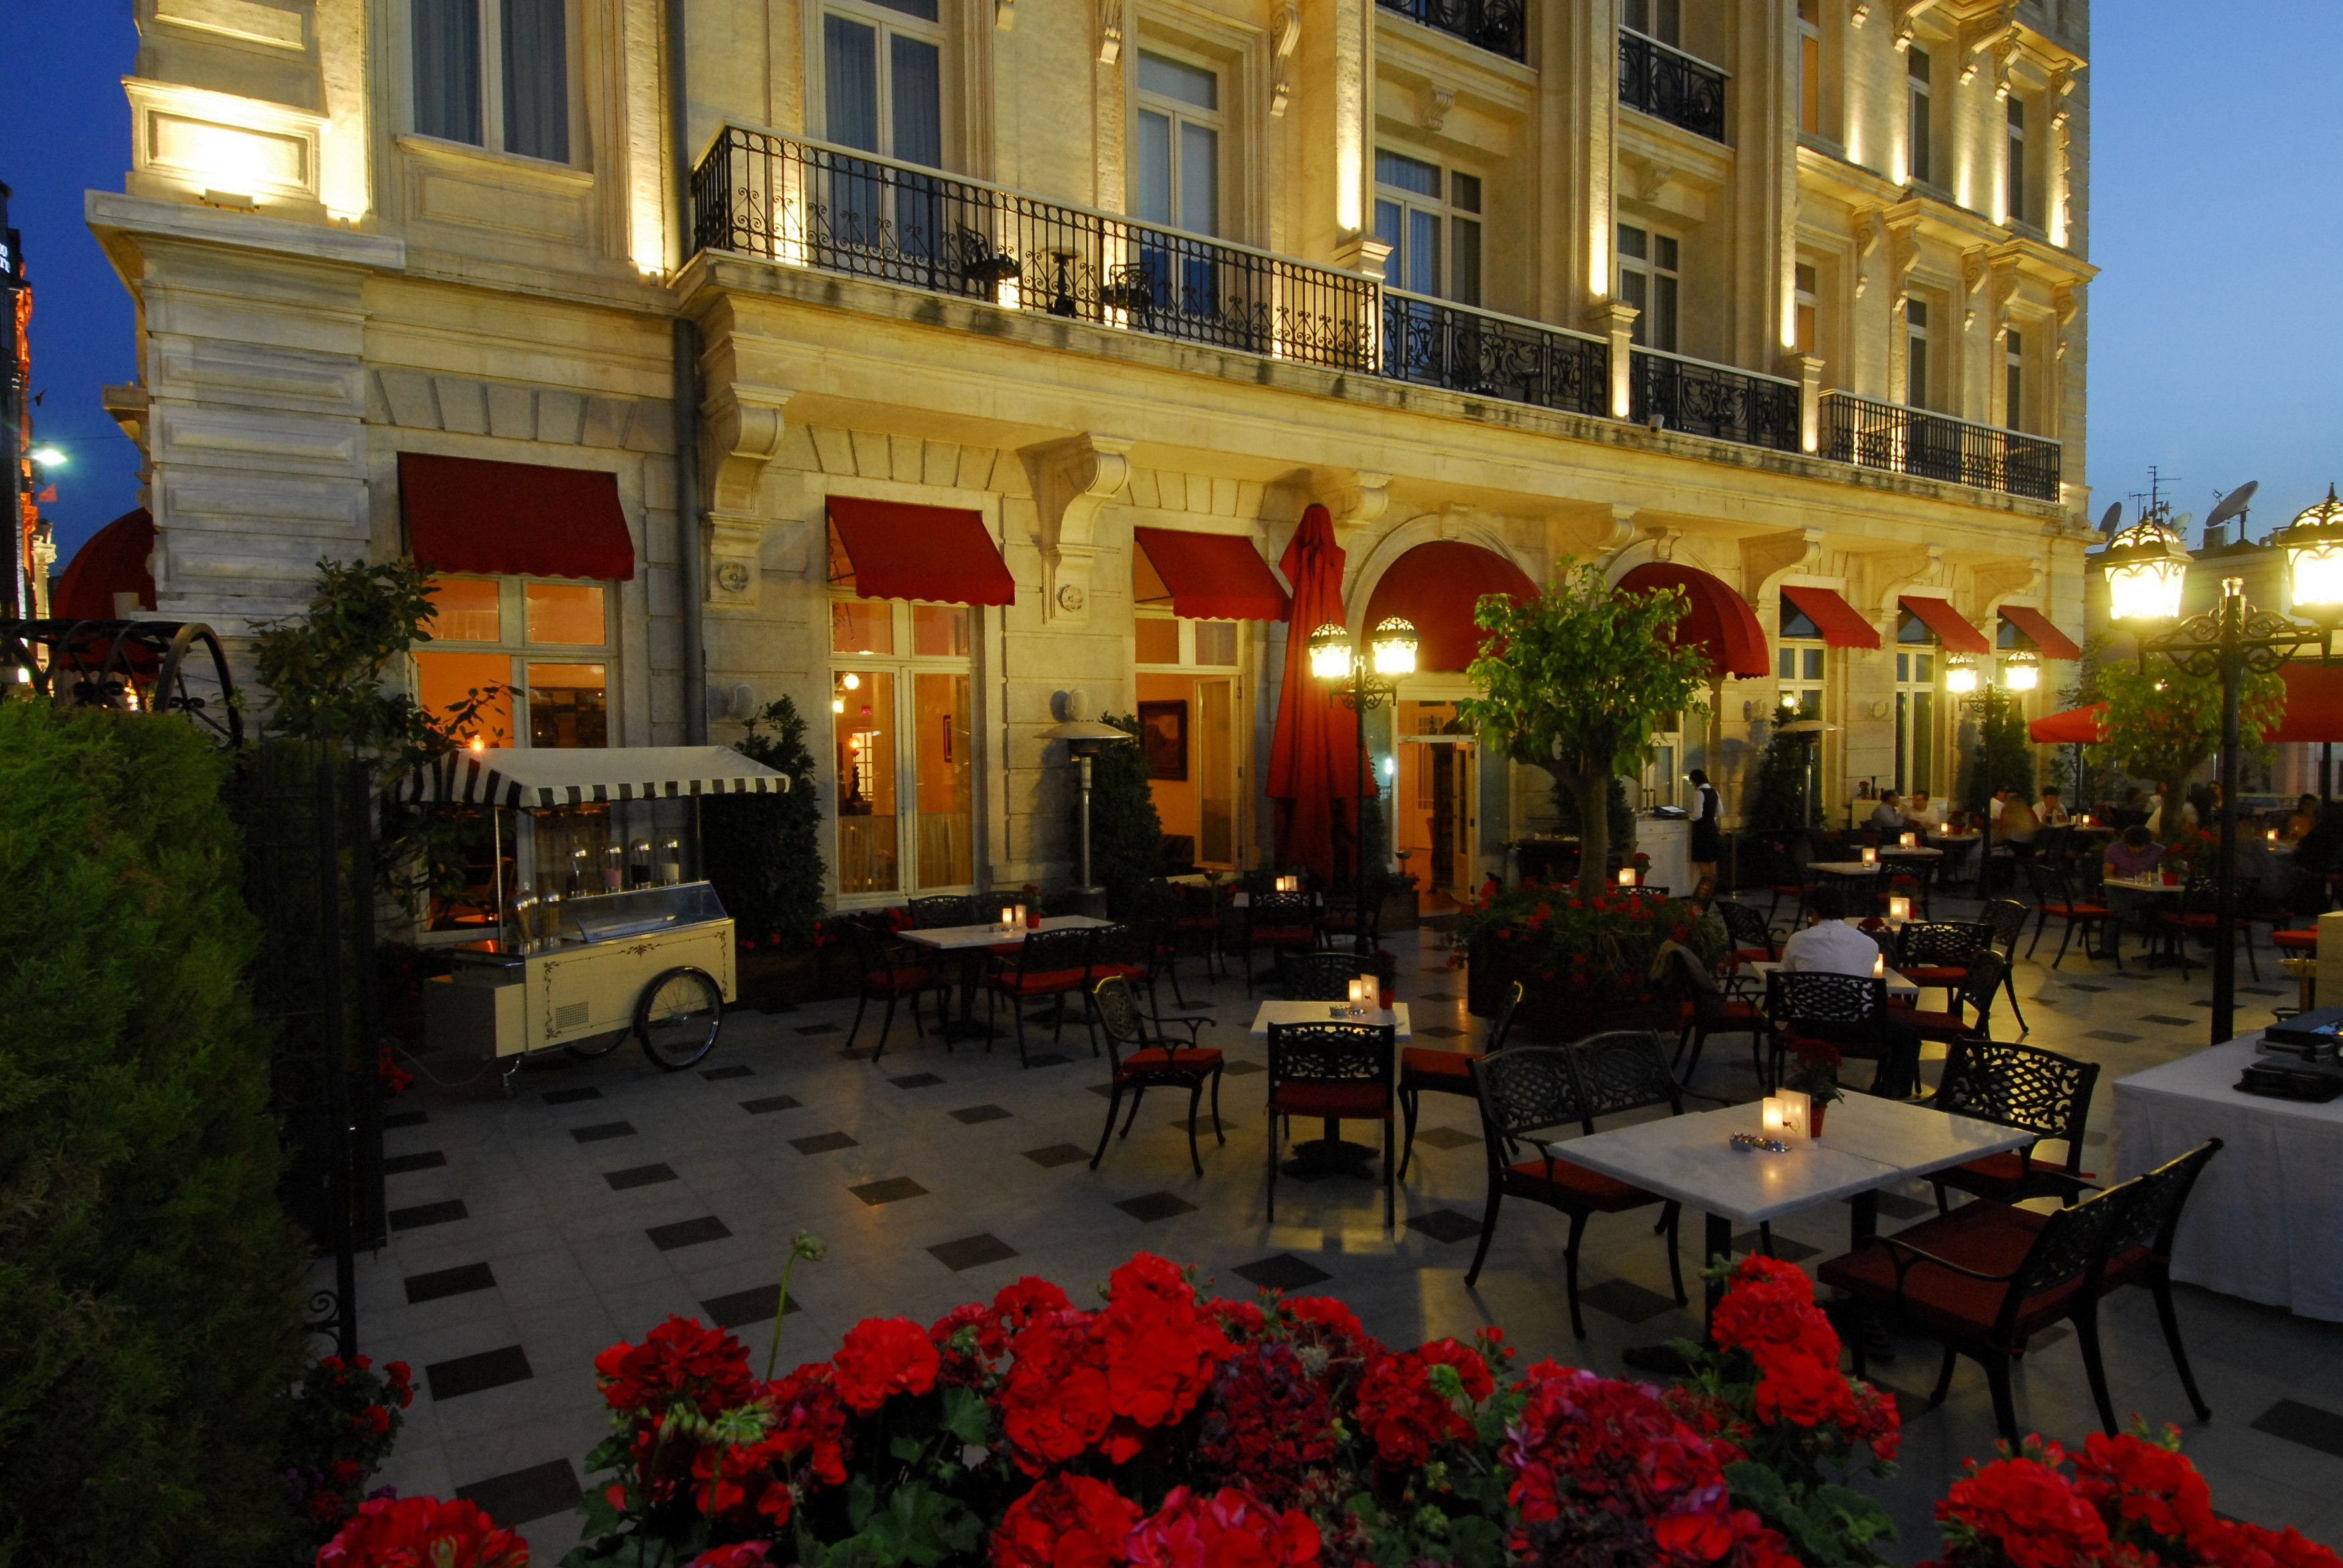 Restaurants In Istanbul Restaurants At Pera Palace Hotel Istanbul Palace Hotel Istanbul Restaurants Istanbul Hotels